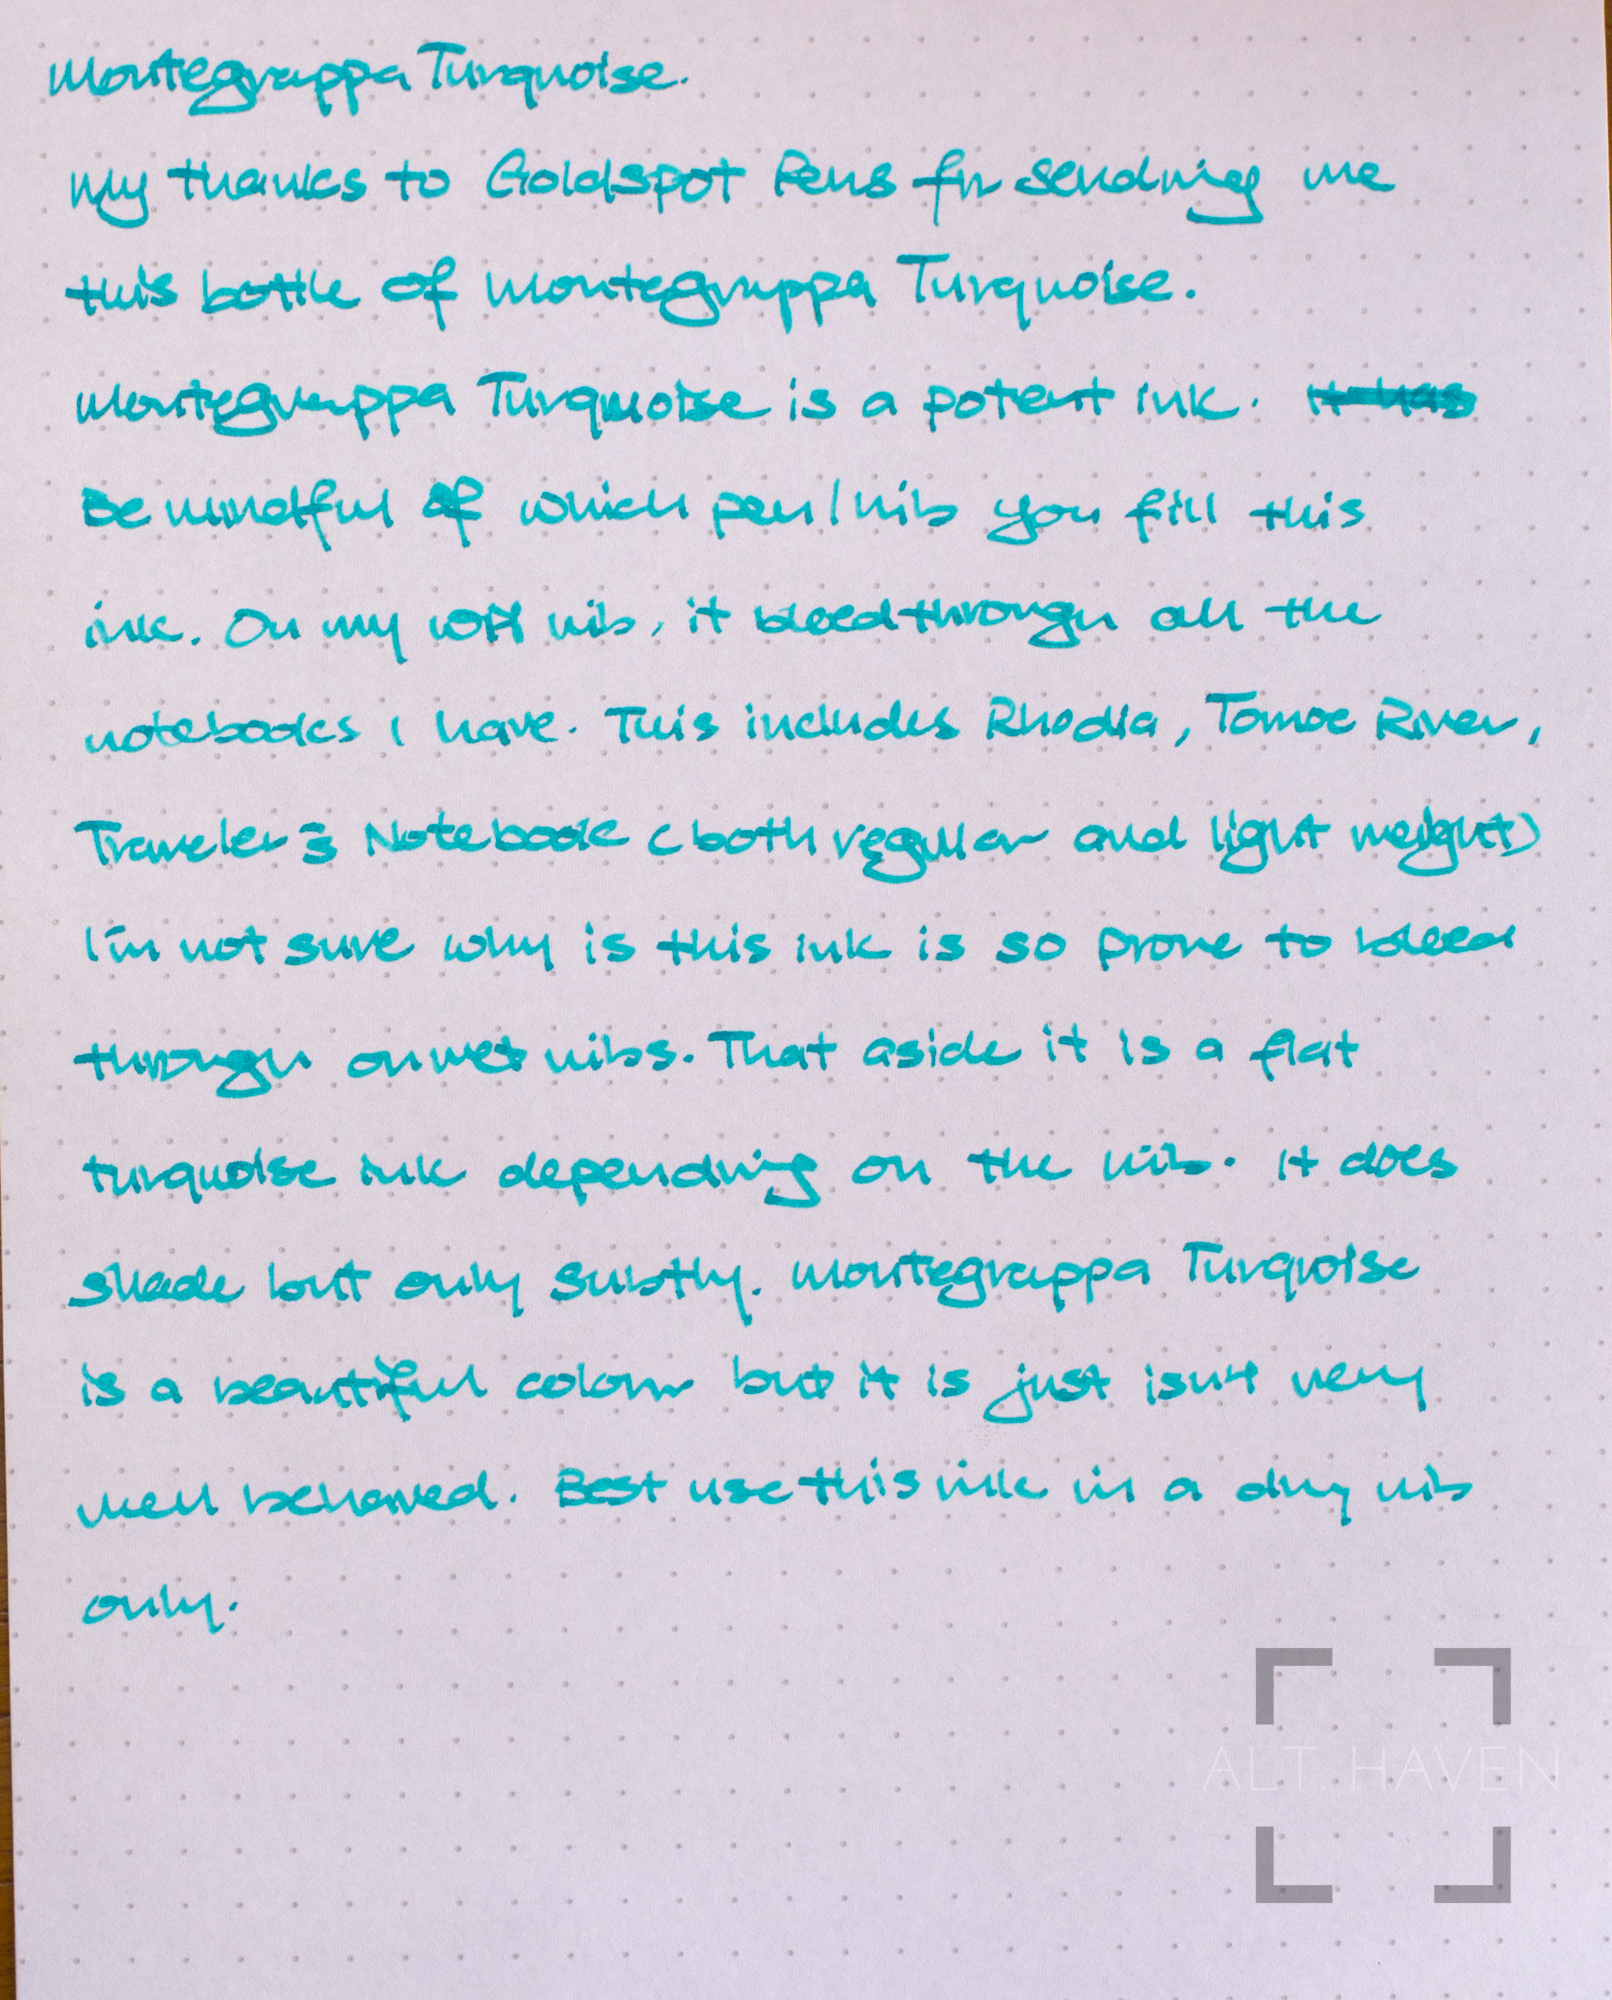 Montegrappa Turquoise-2.jpg